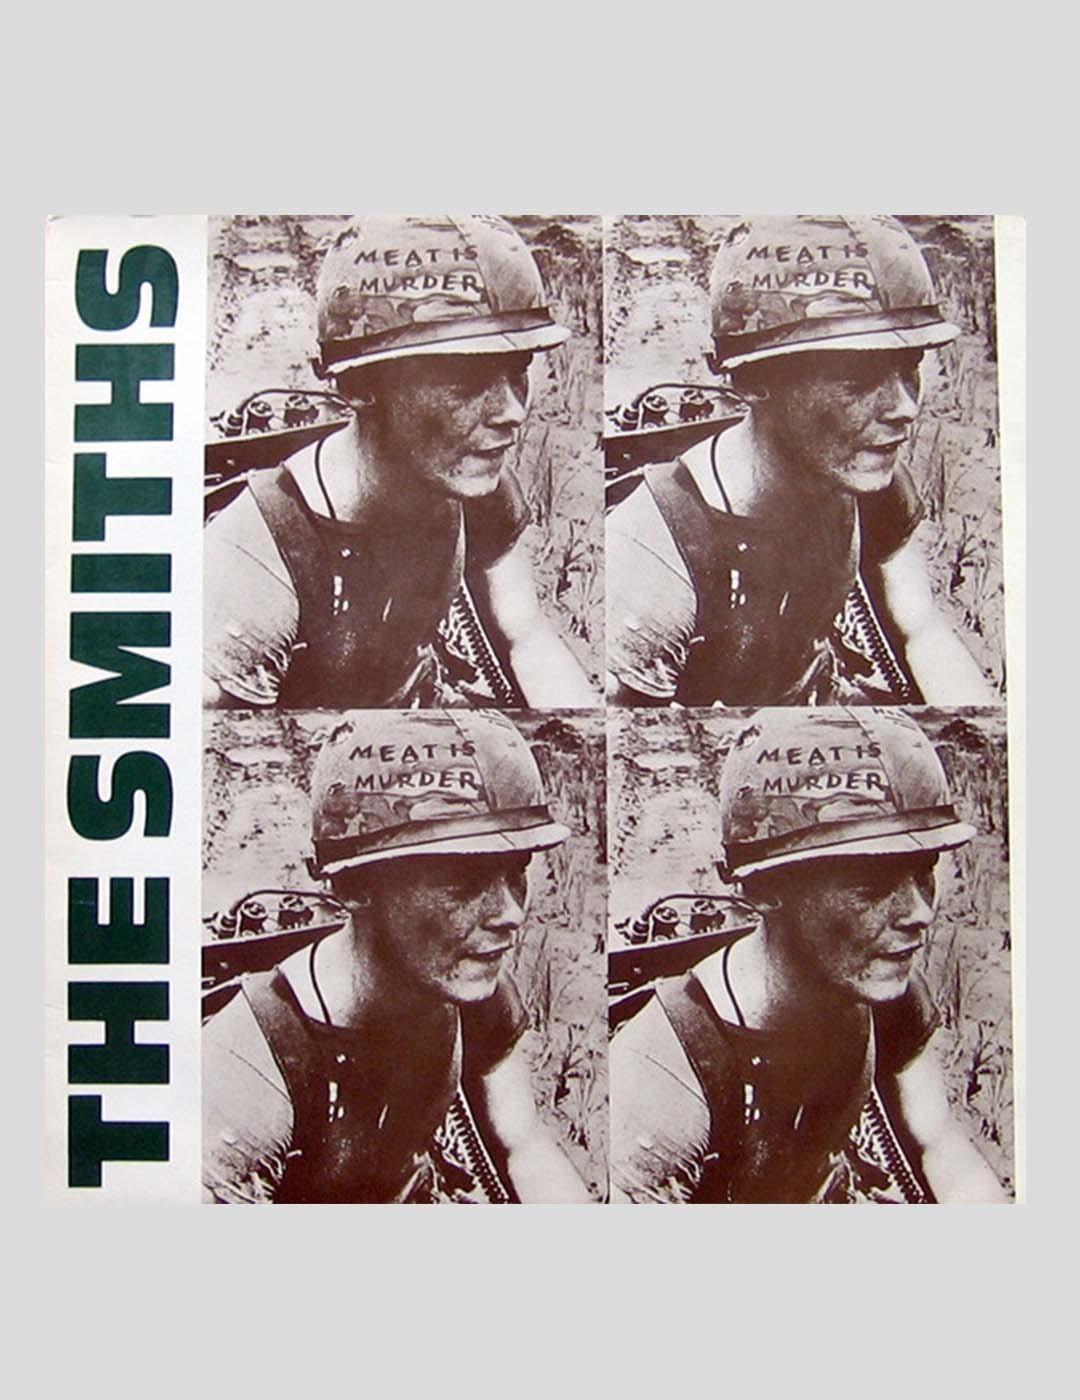 VINILO THE SMITHS - MEAT IS MURDER LP VINYL